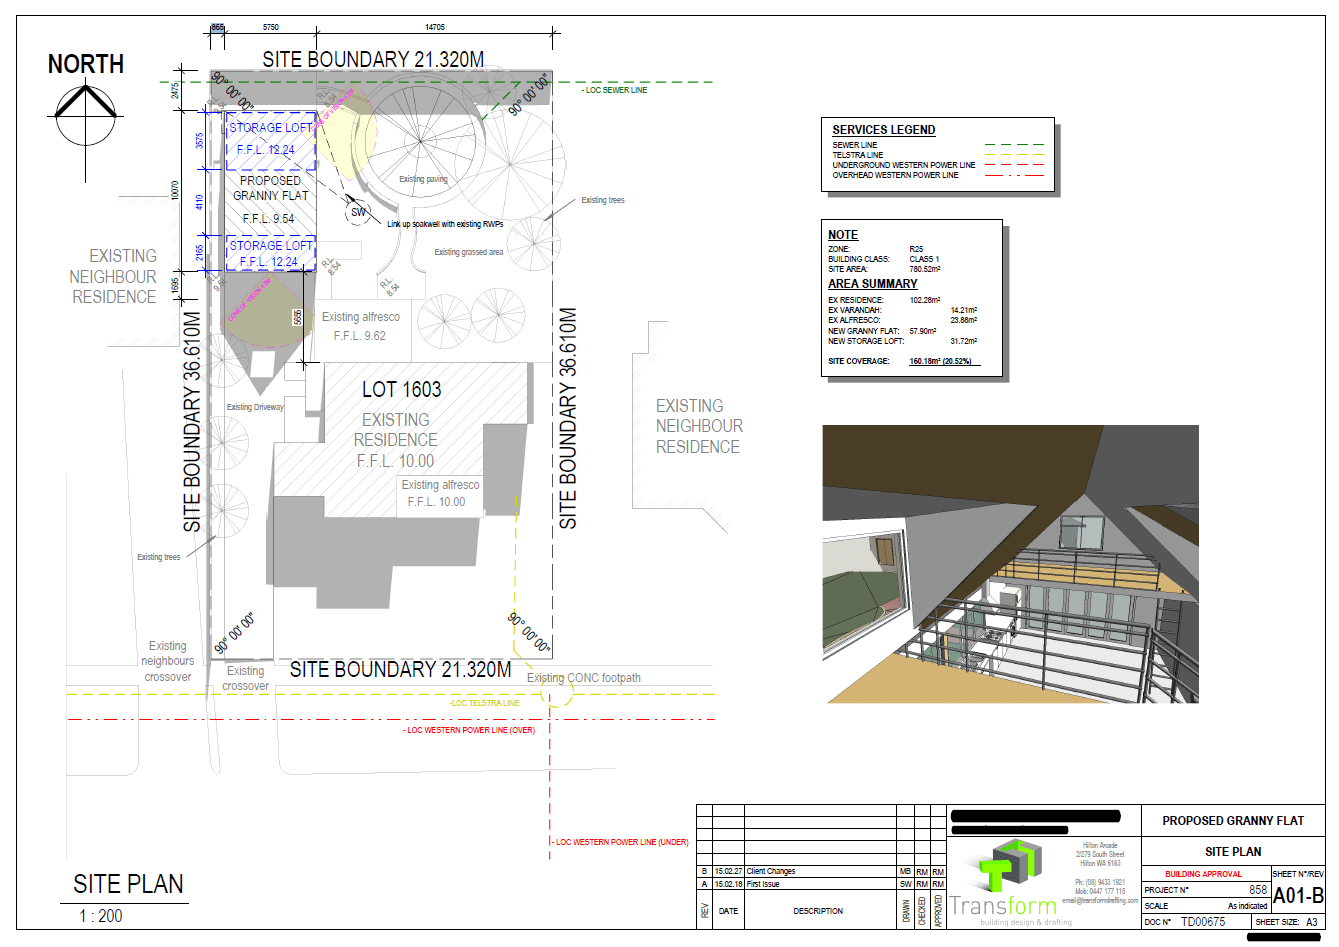 2. Site Plan (6)